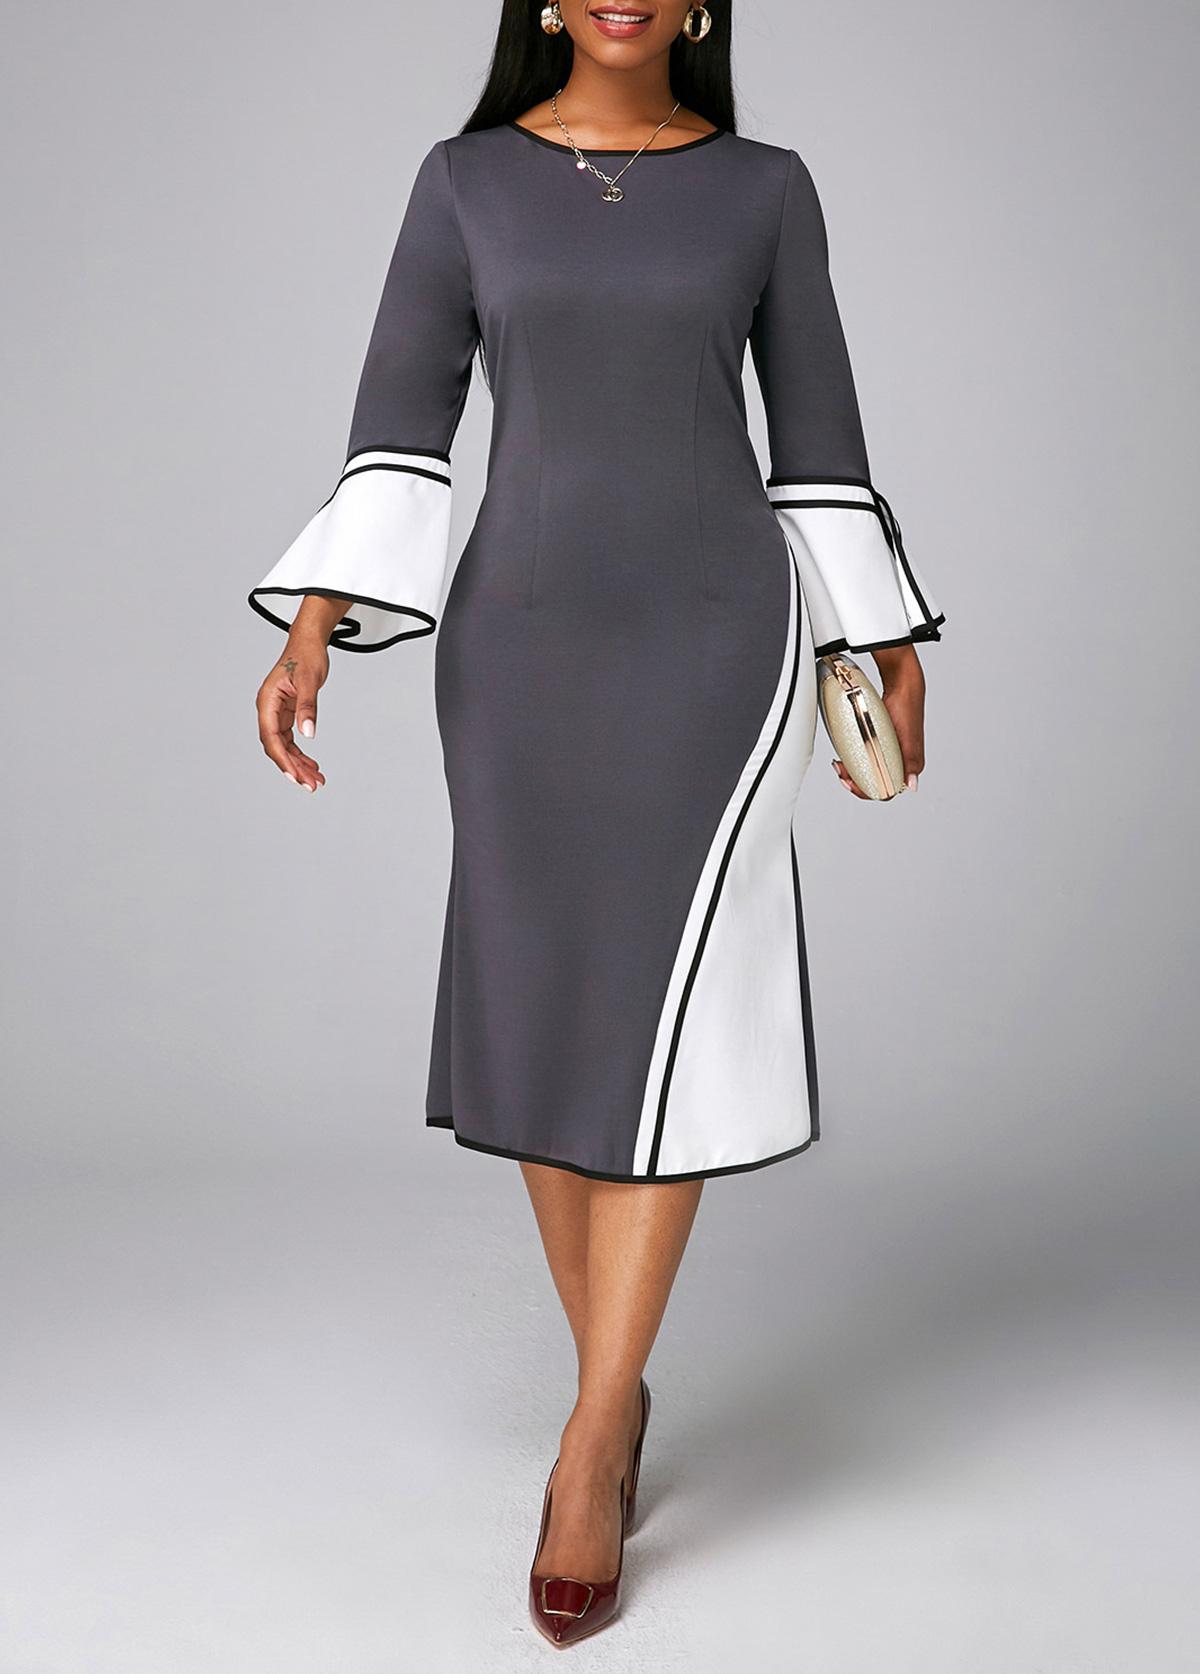 Contrast Flare Sleeve Round Neck Dress